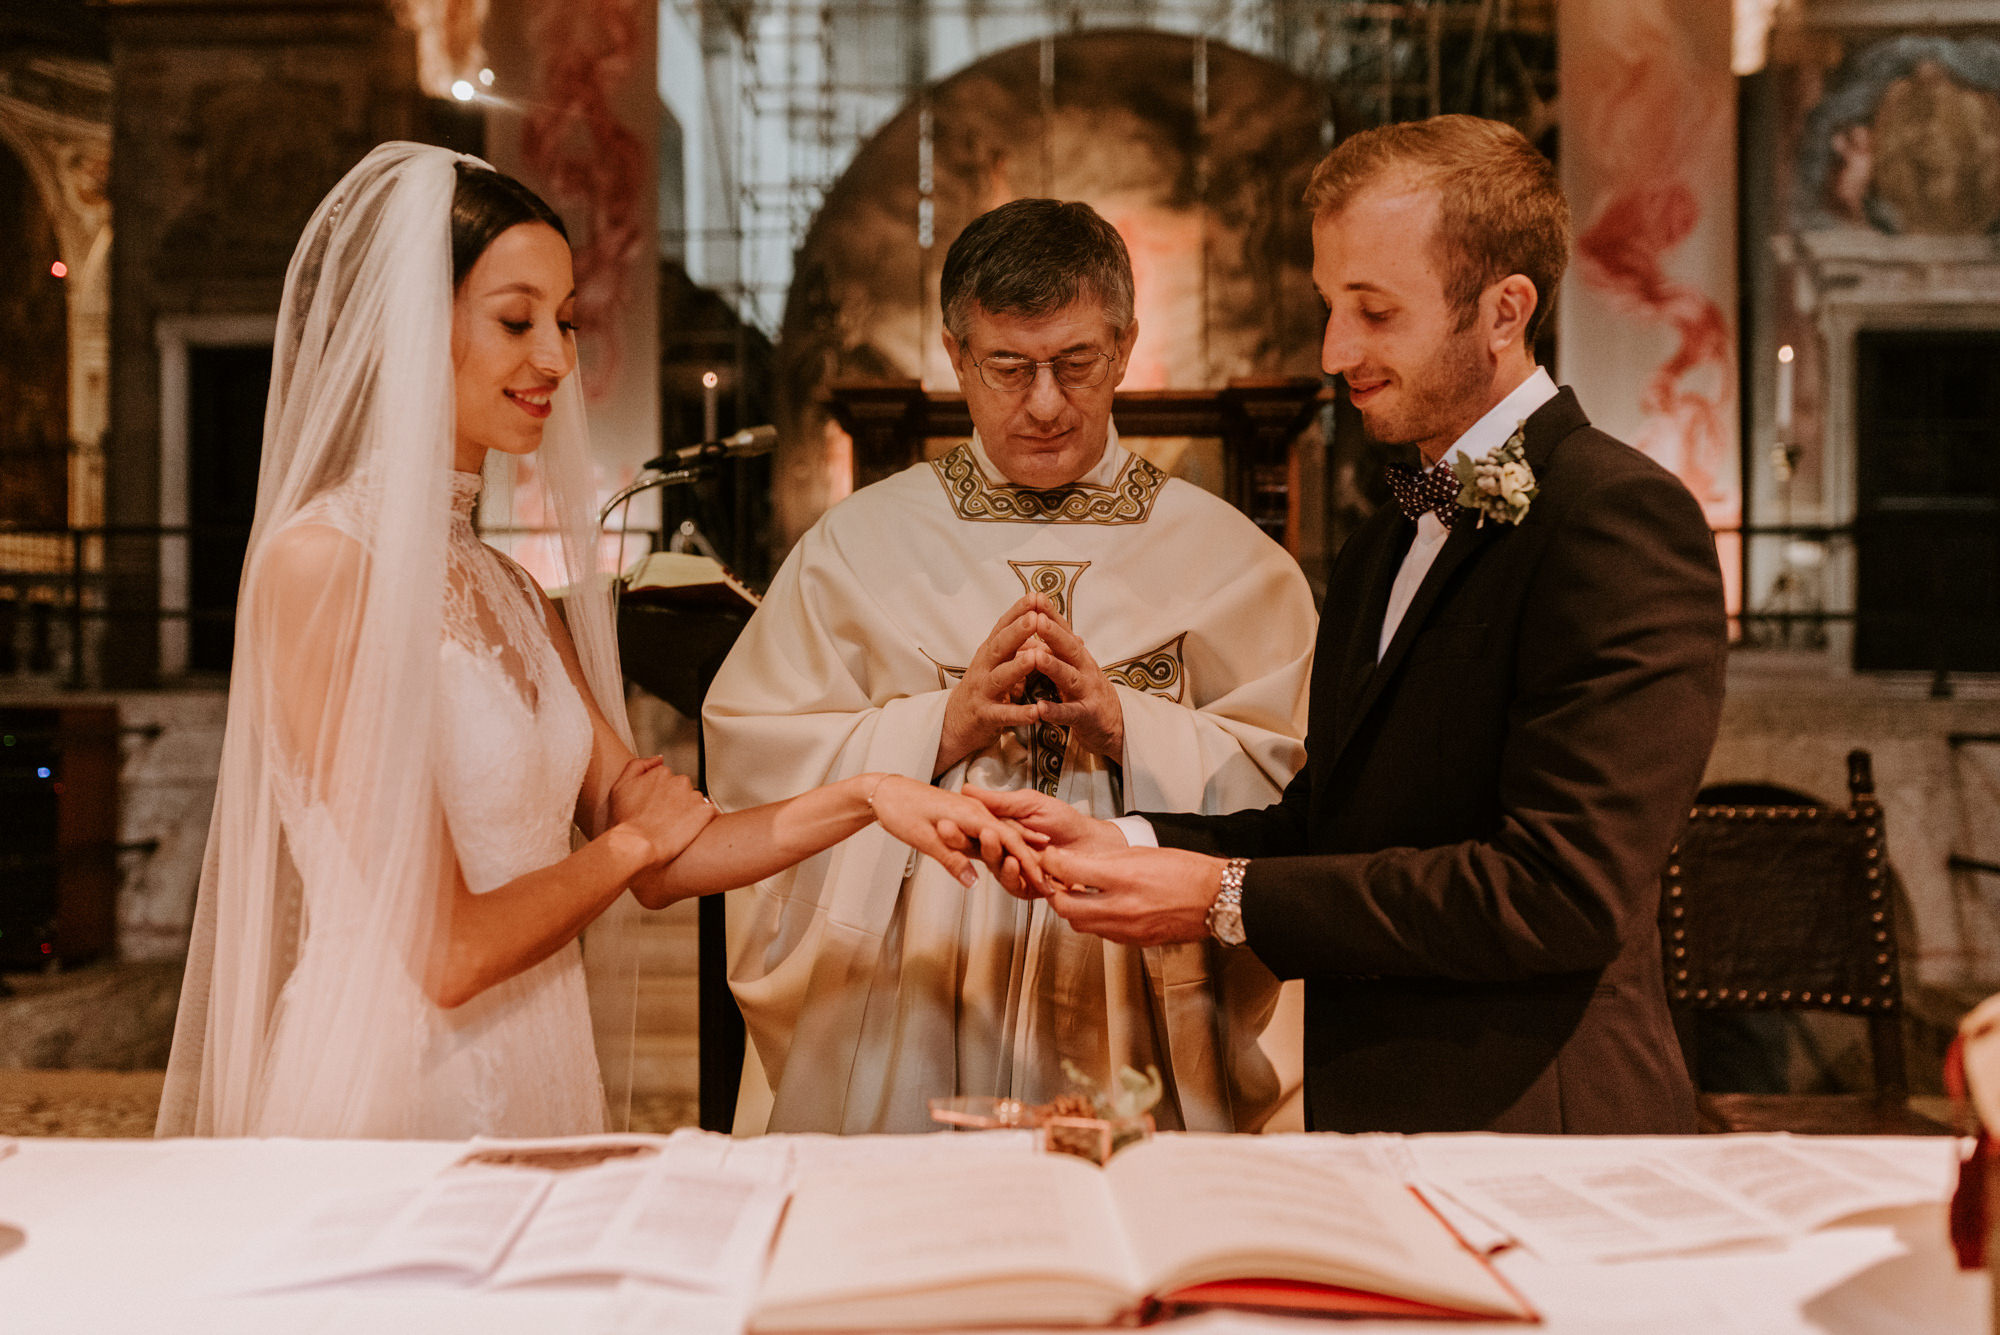 FOTO+PHOTO+BODA+WEDDING+ITALIA+ITALY+MAURICIO+GARAY+MAURICIOGARAY+WEDDINPHOTOGRAPHER+FOTOGRAFODEBODA-916.jpg